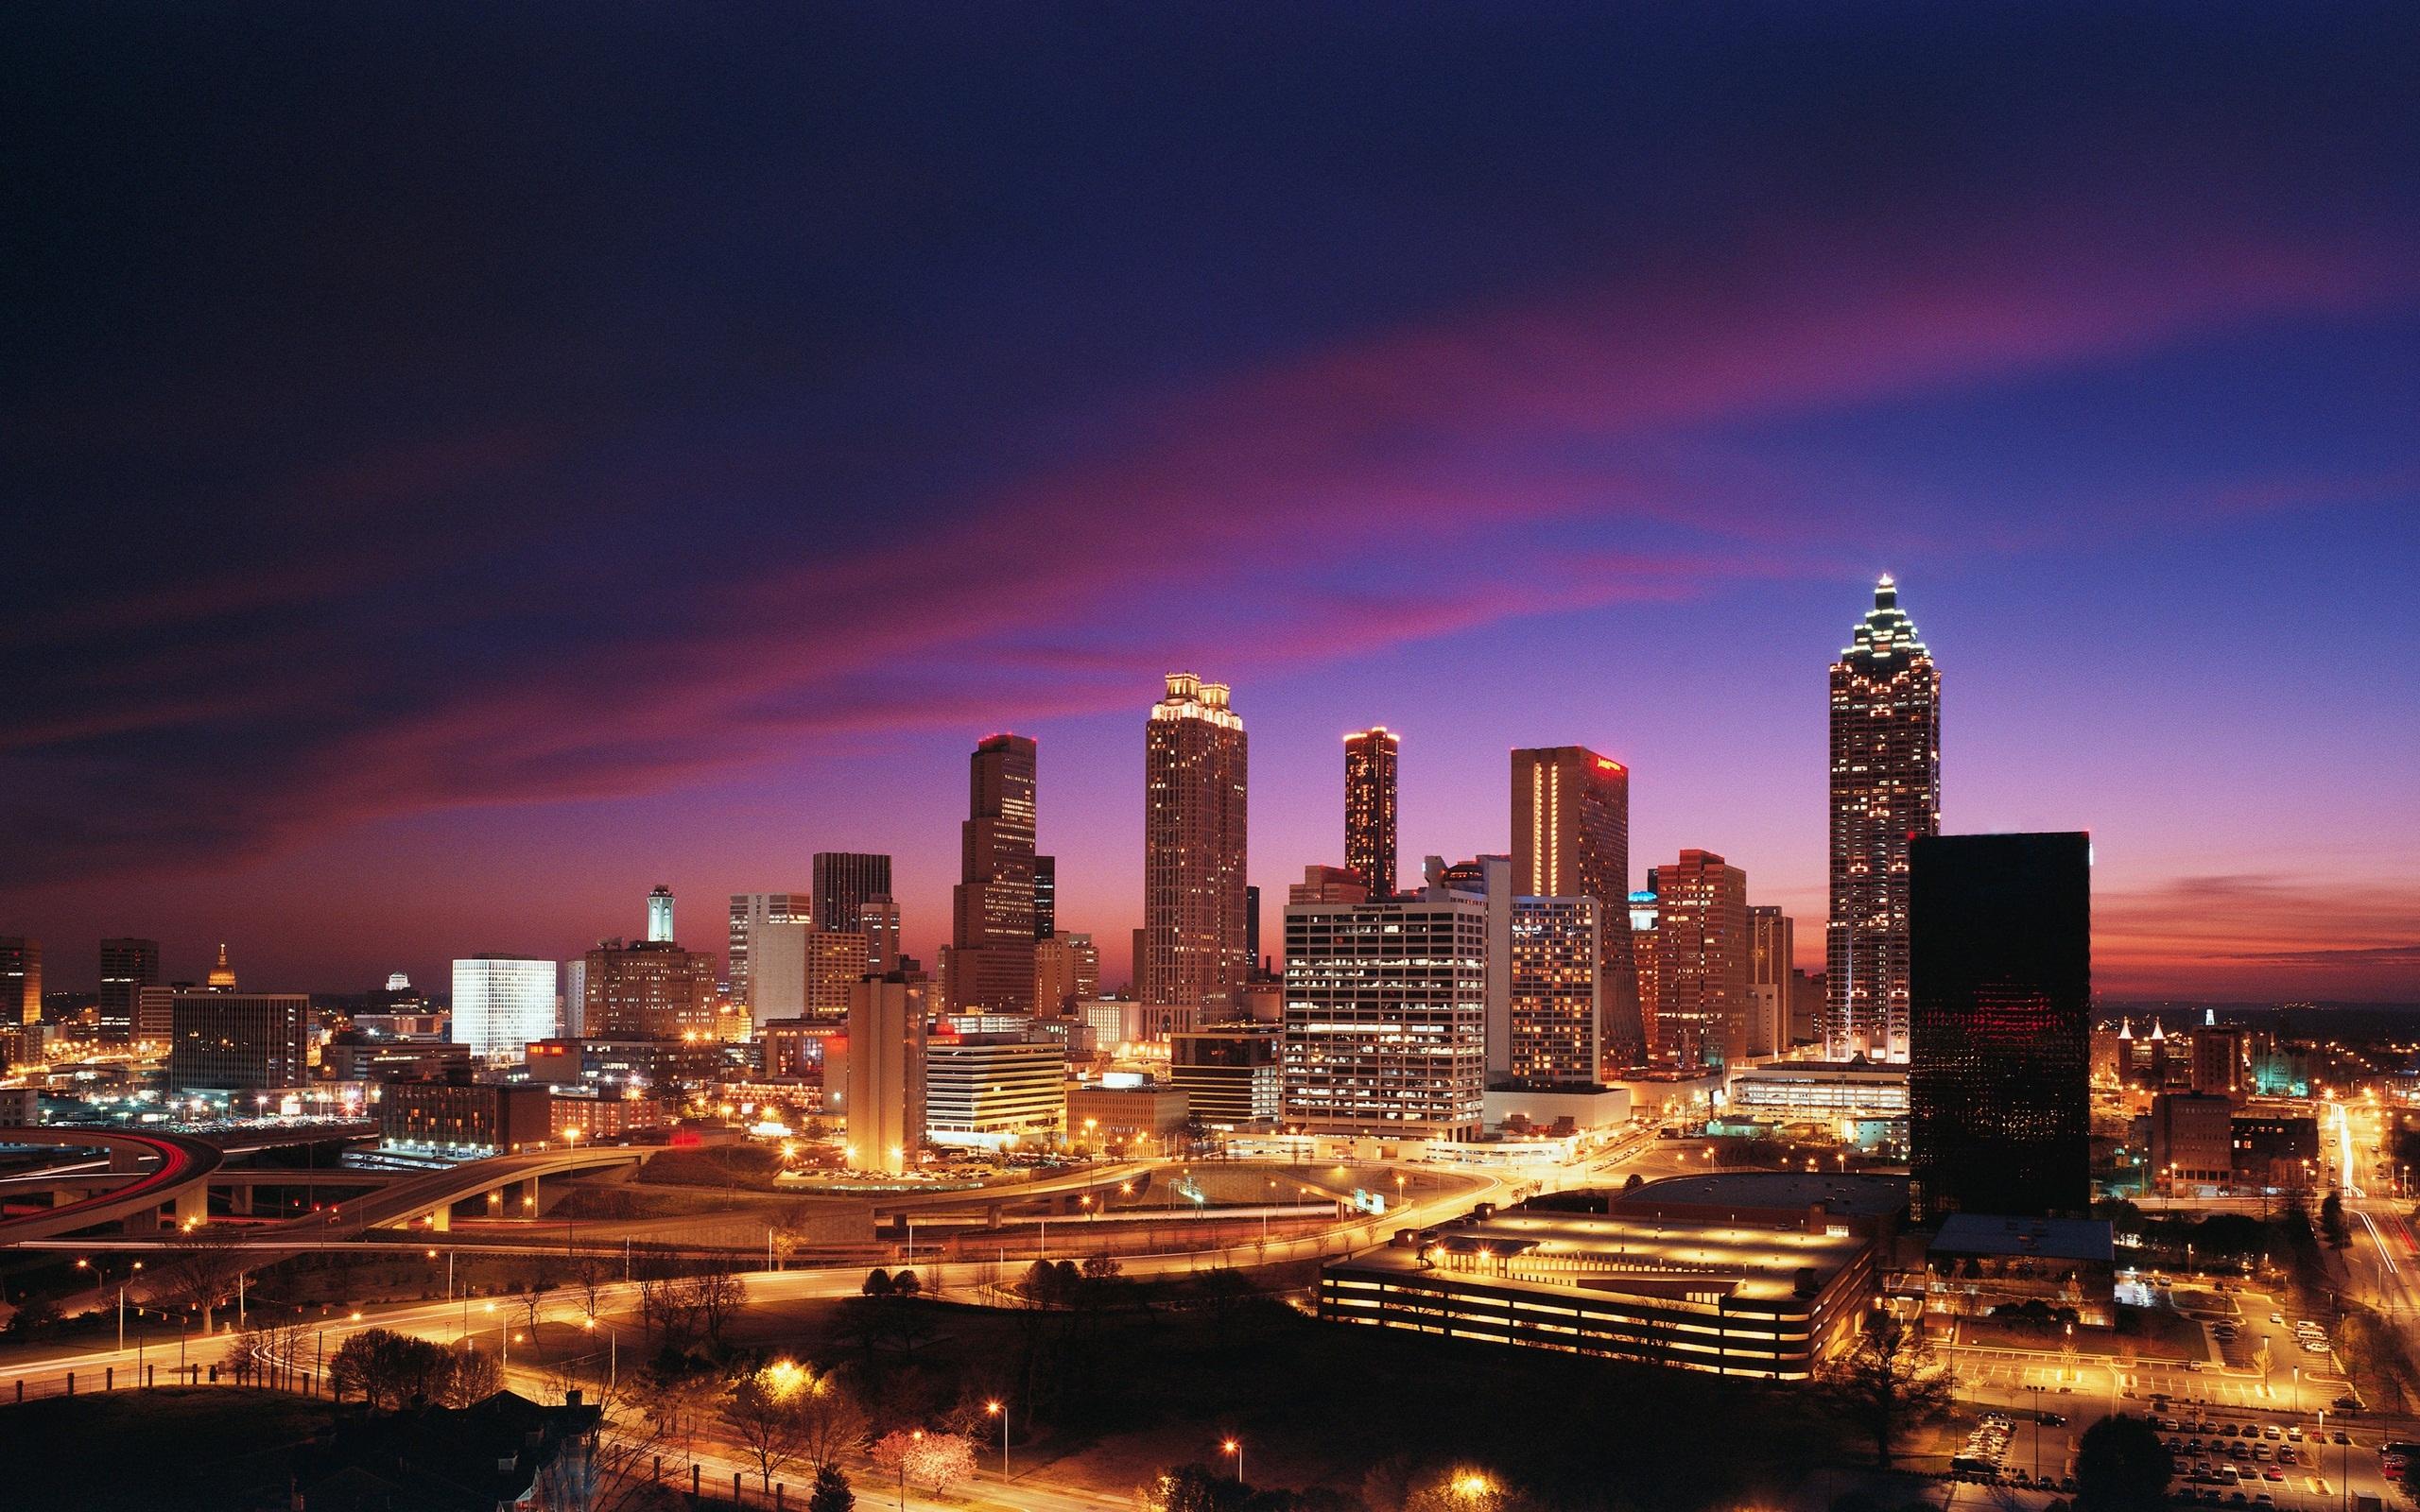 Atlanta Skyline Wallpaper: Free Atlanta City Wallpaper Images Hd Wallpapers Again 2560x1600px